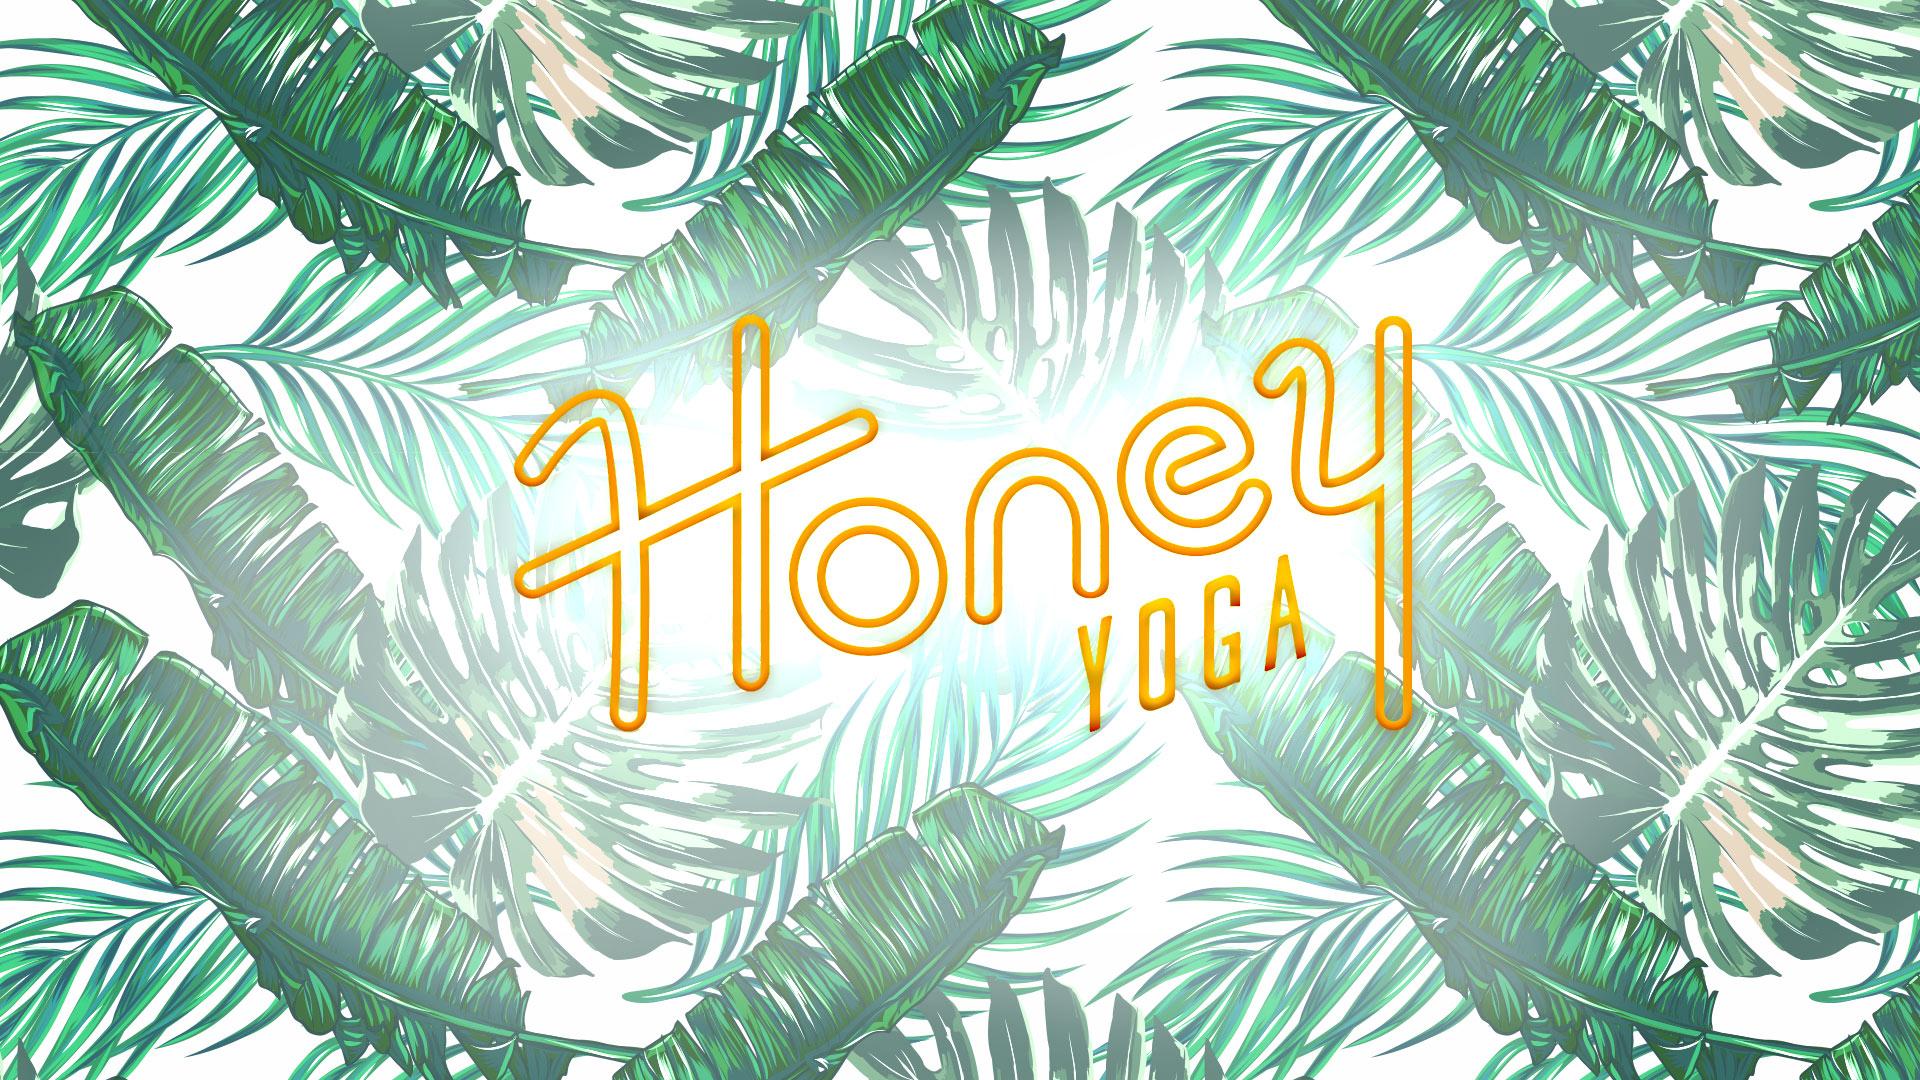 Honey_yoga_15.jpg